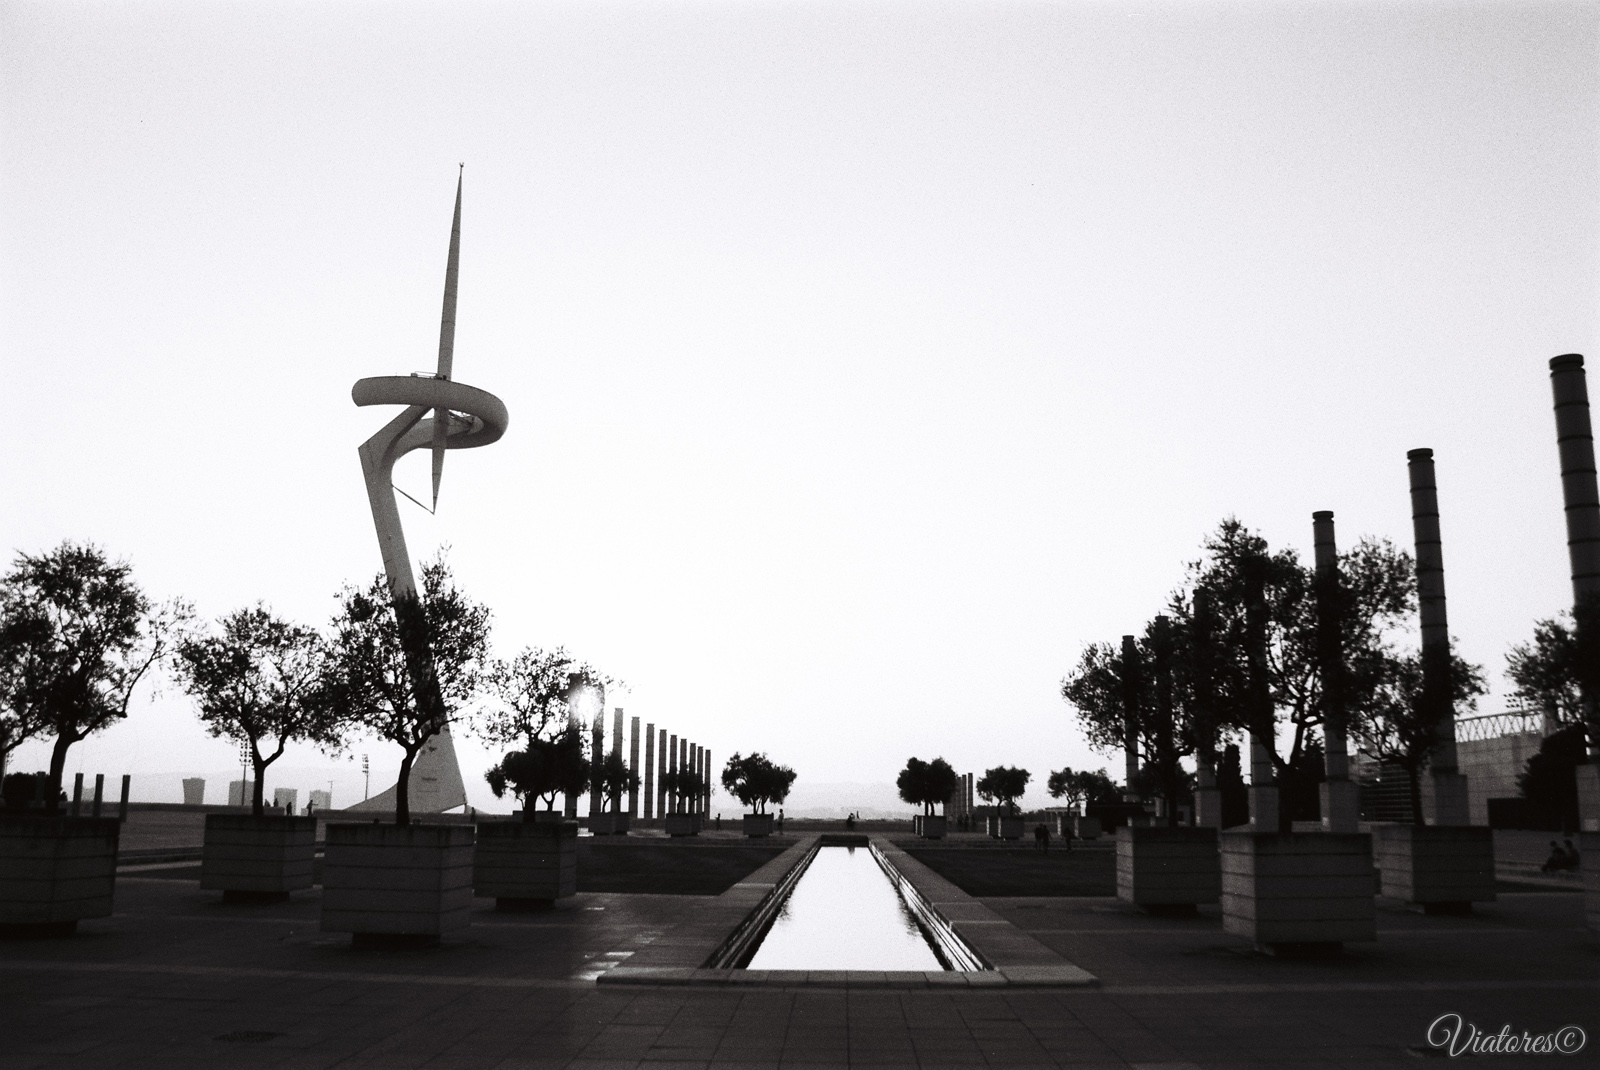 Torre Telefonica. Barcelona. Spain